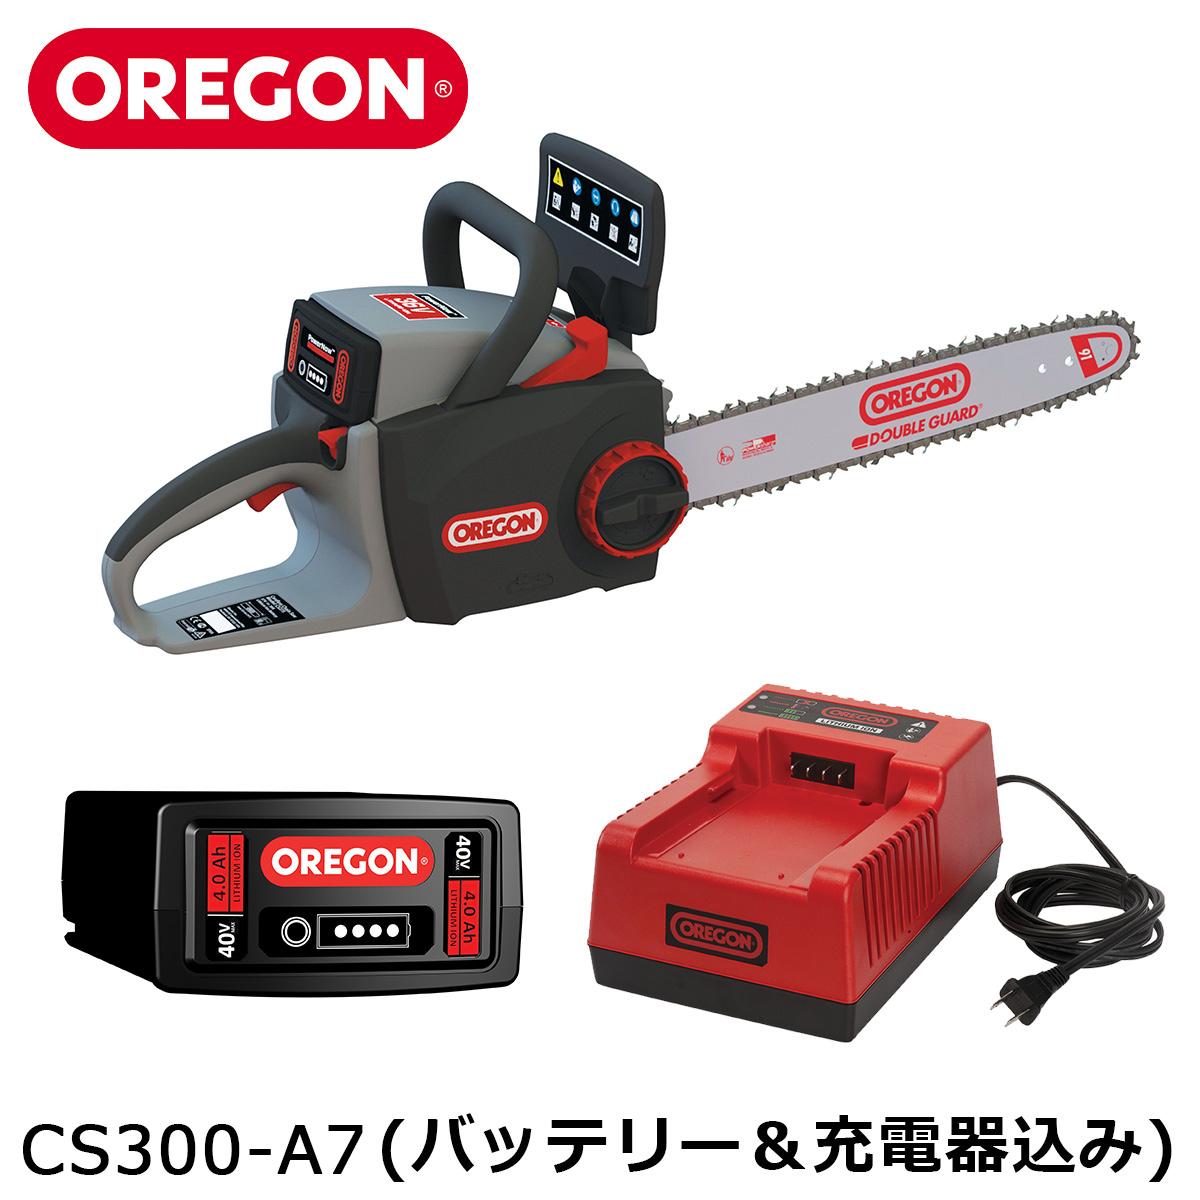 OREGON CS300-A7 CTS 電動チェンソー バッテリー式 コードレス 自動目立て機能 低騒音 16インチ 40cm チェーンソー オレゴン 【バッテリー、充電器込み】